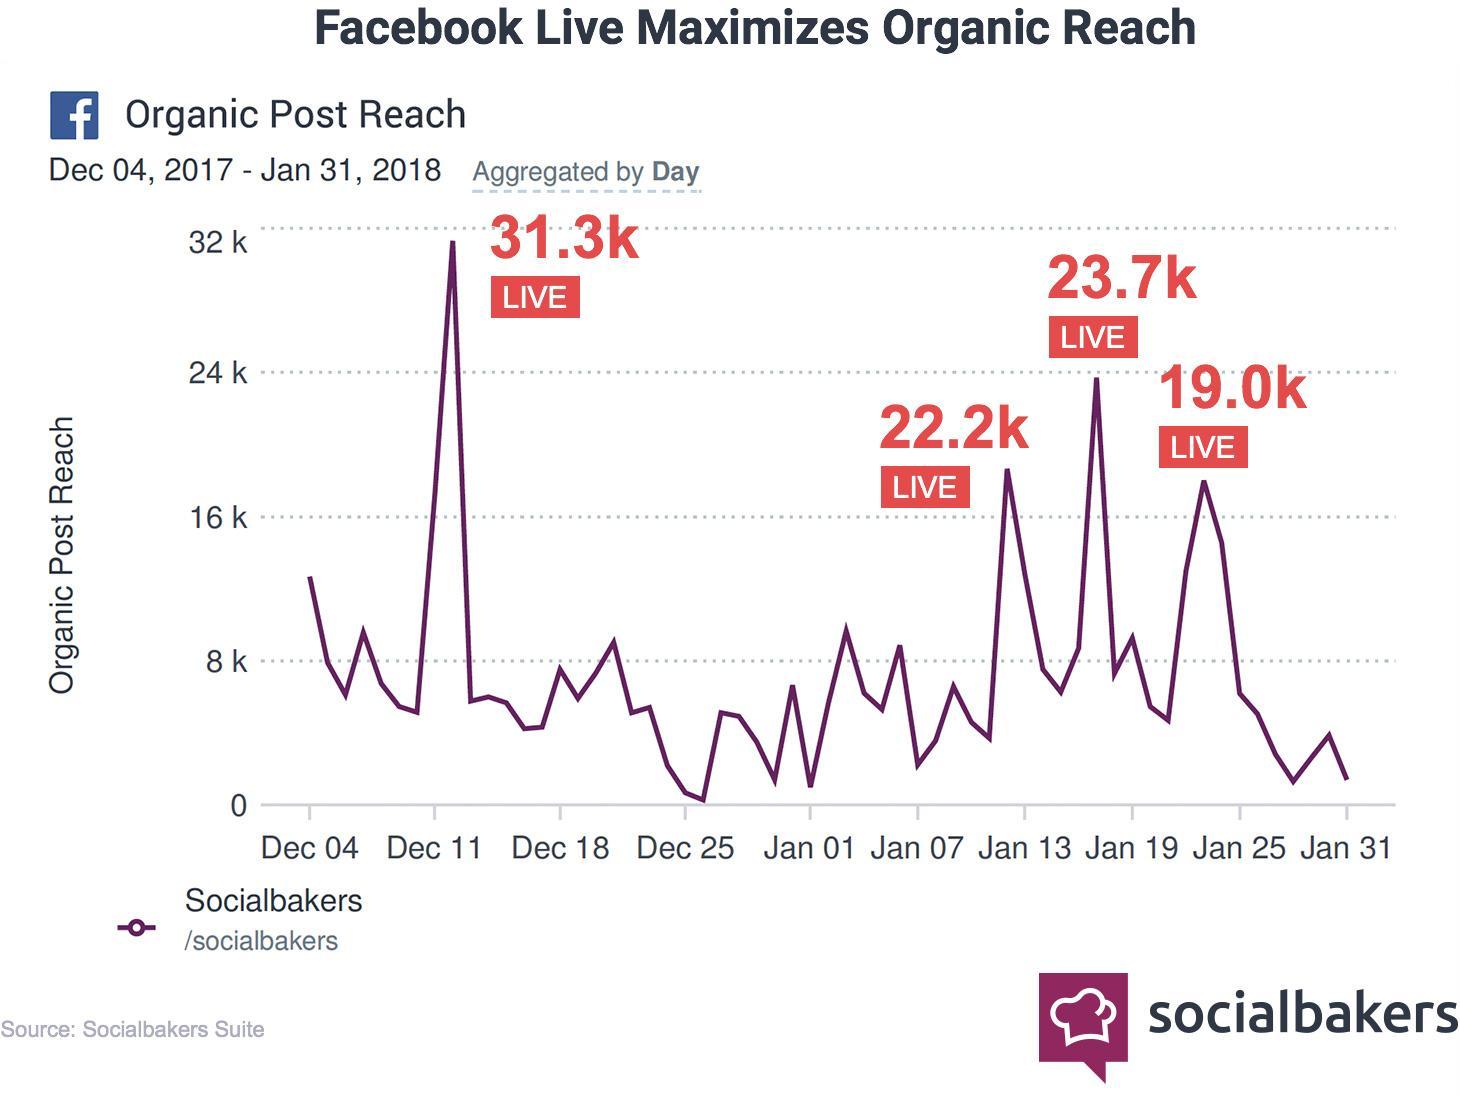 socialnaker study on Facebook live video